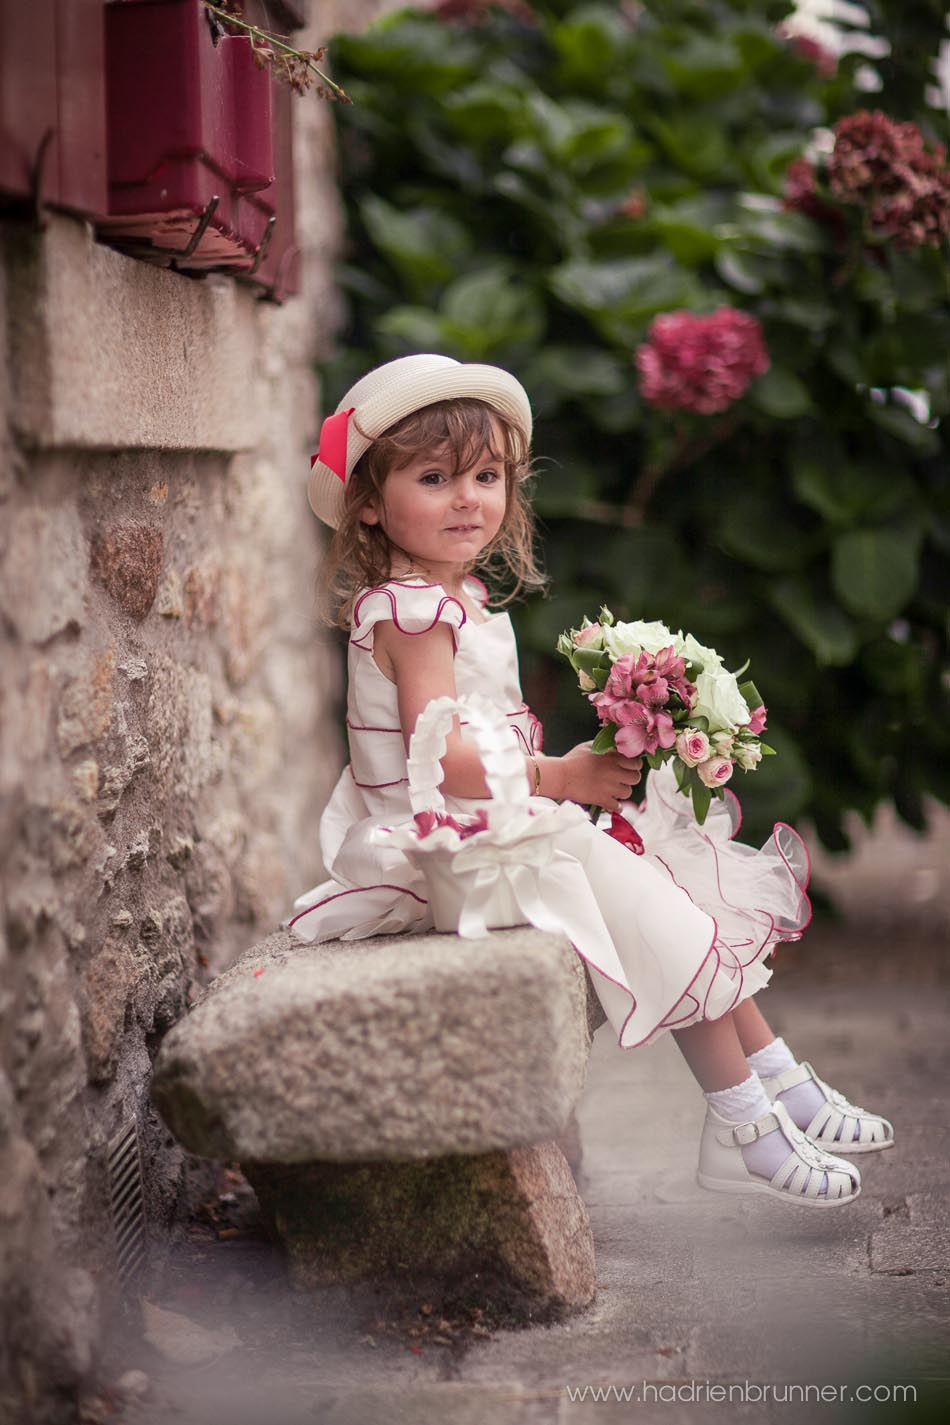 photographe-piriac-enfant-hadrien-brunner